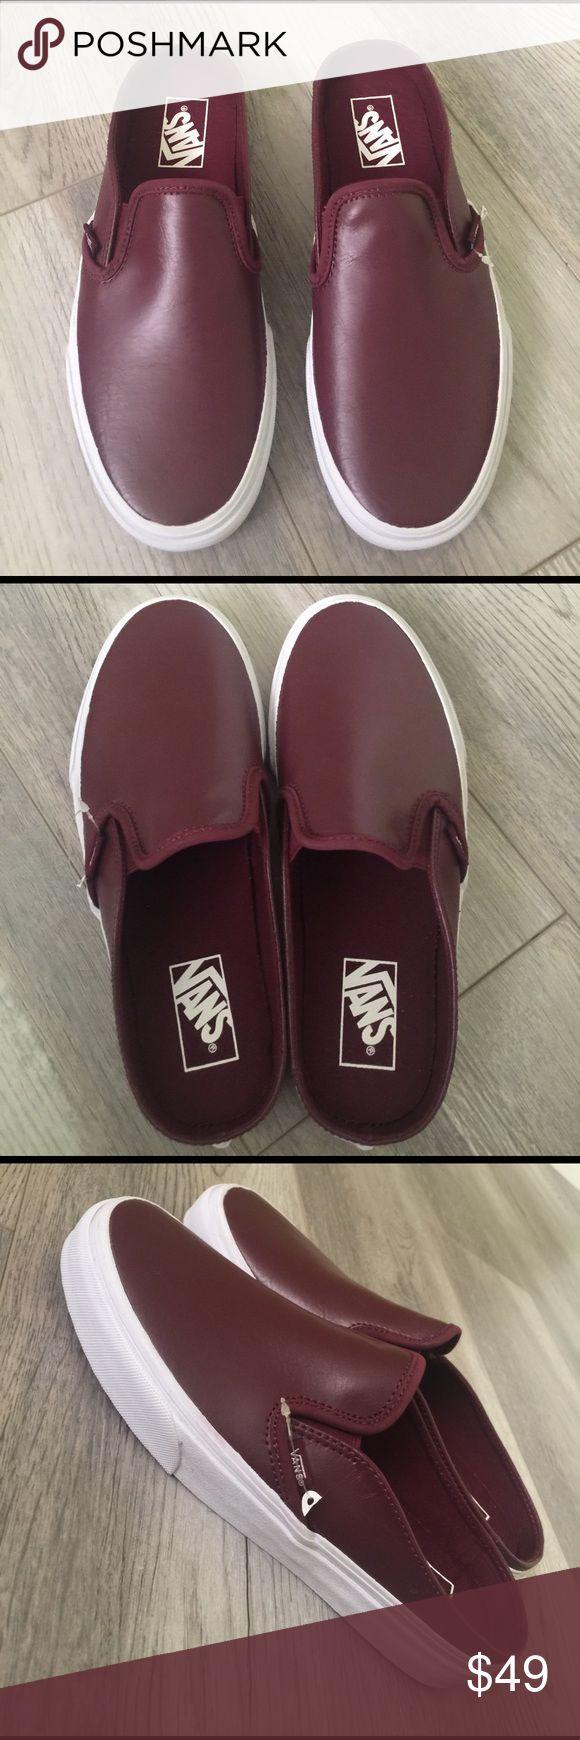 Can i buy vans for cheap mens vans slip on shoes vans on the wall - Vans Slip On Sneakers Maroon Brand New W Box